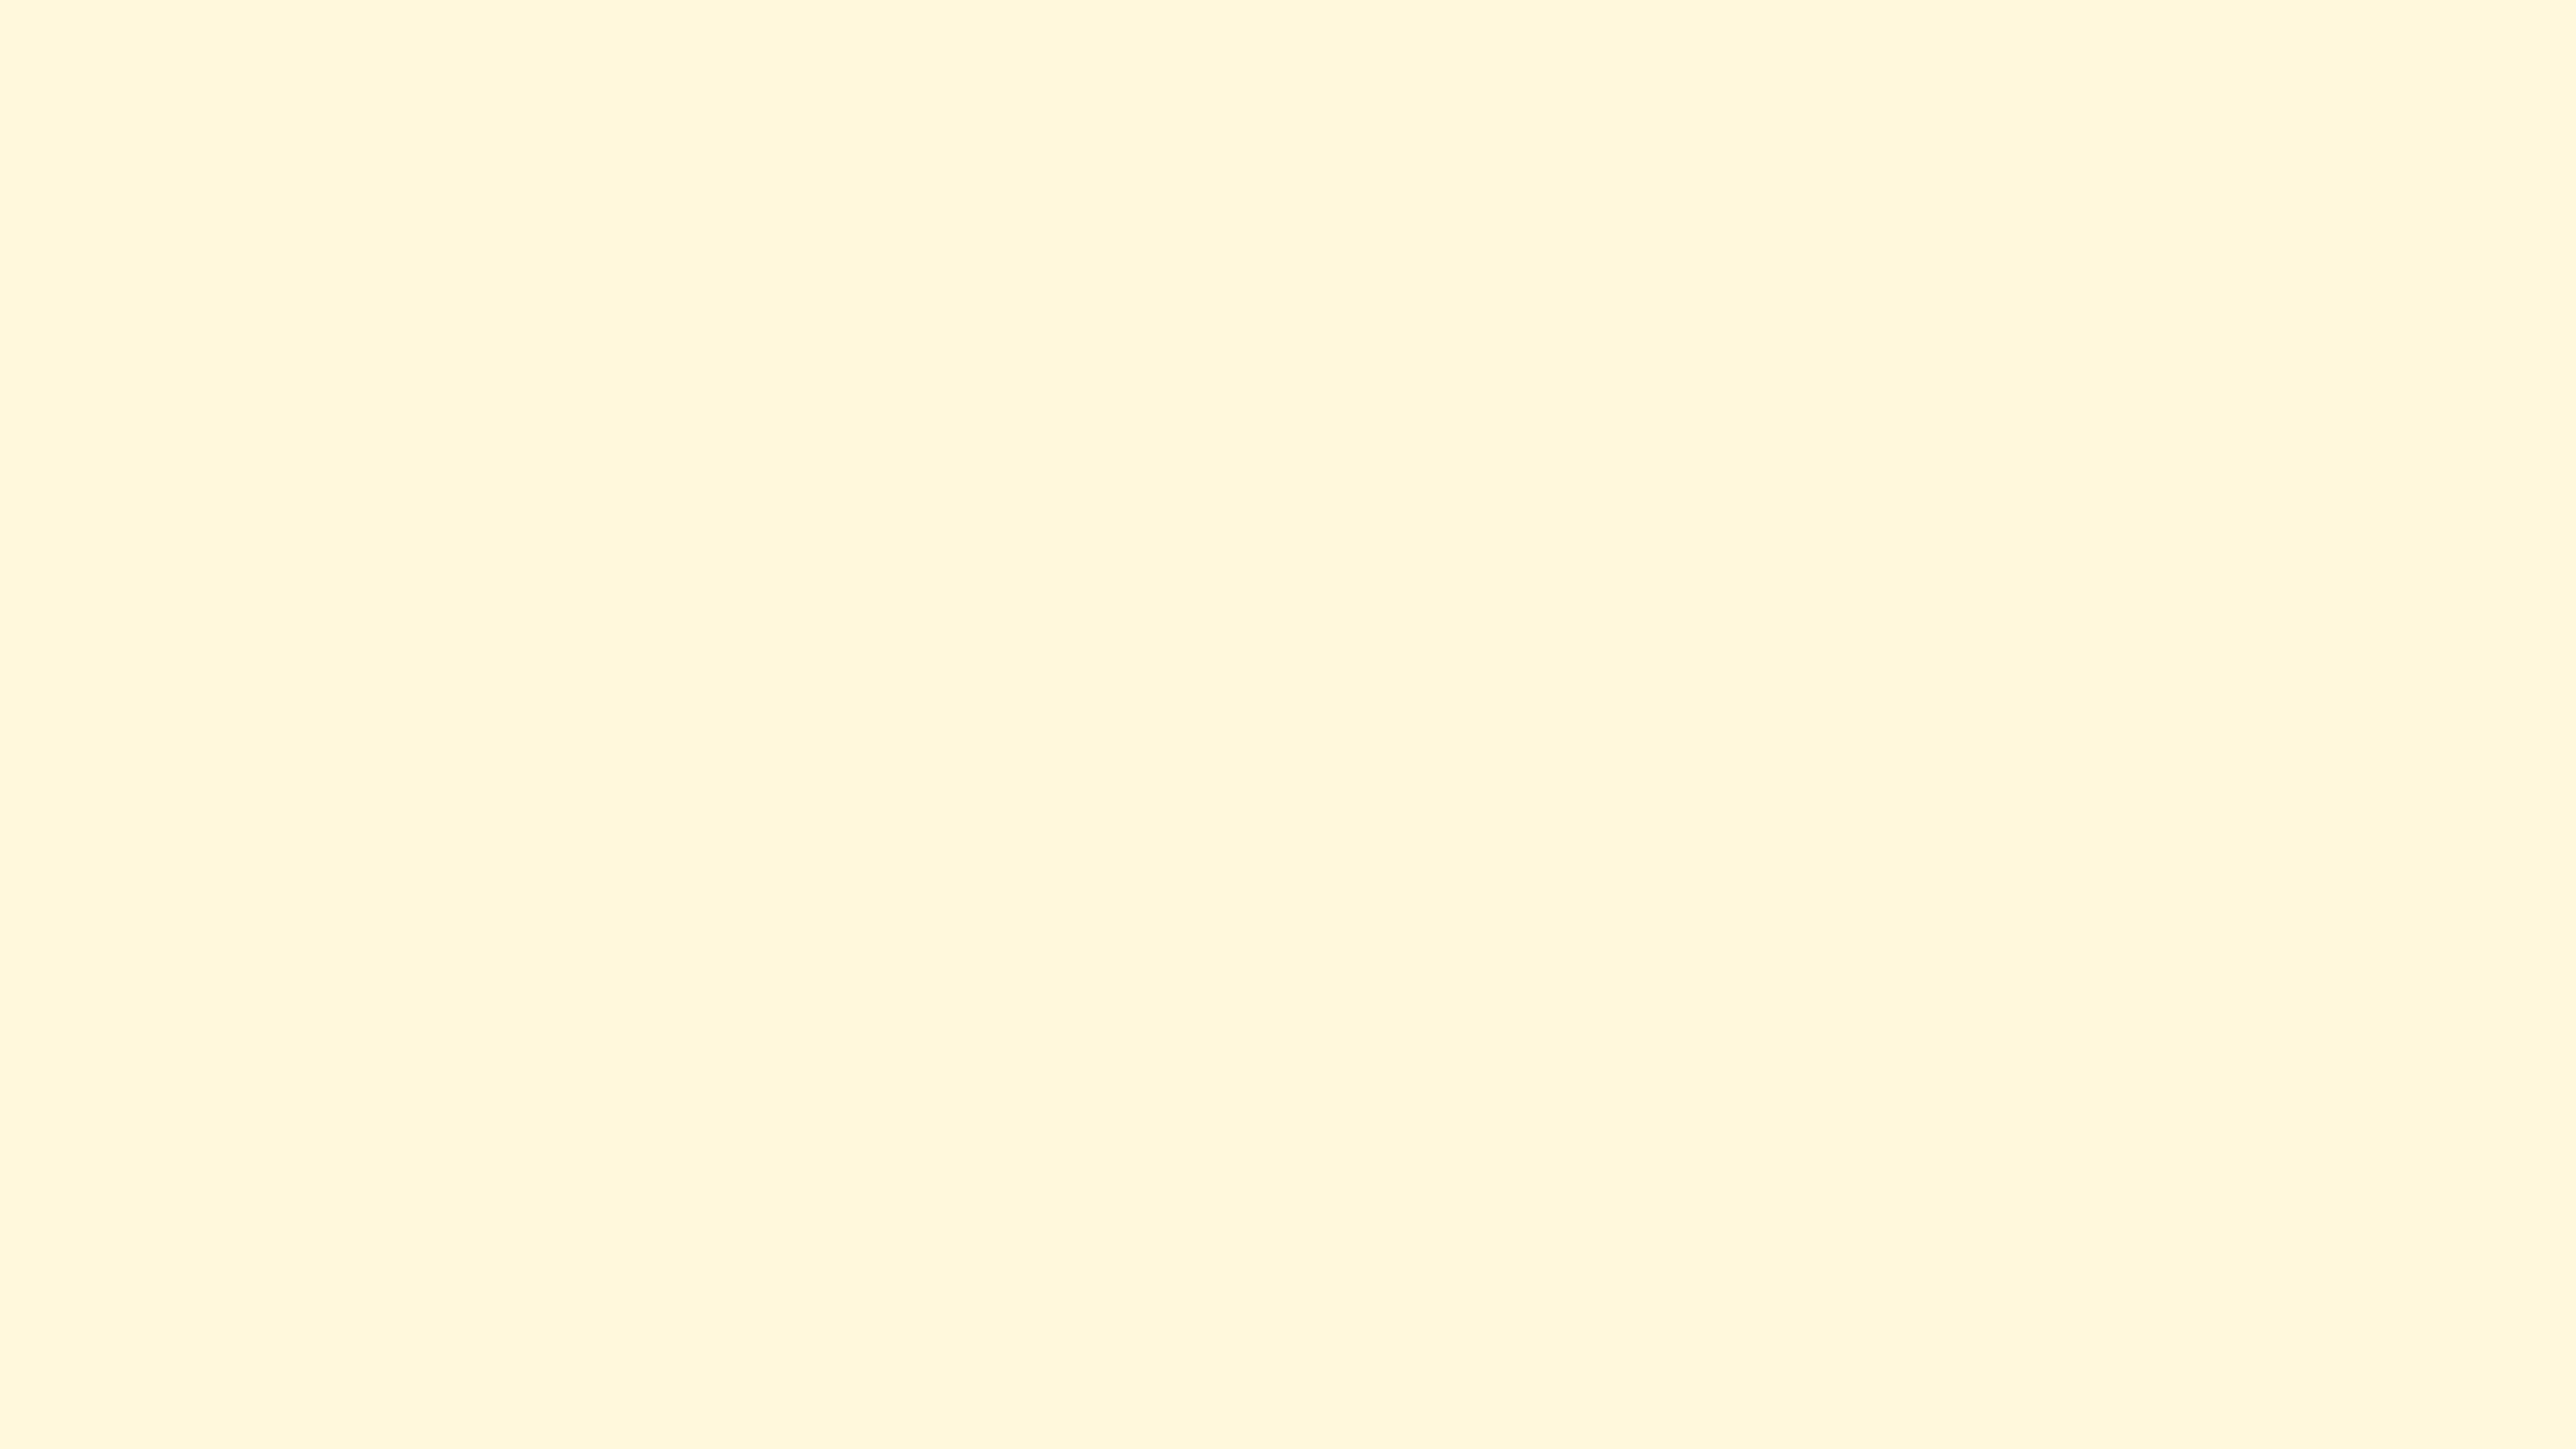 5120x2880 Cornsilk Solid Color Background